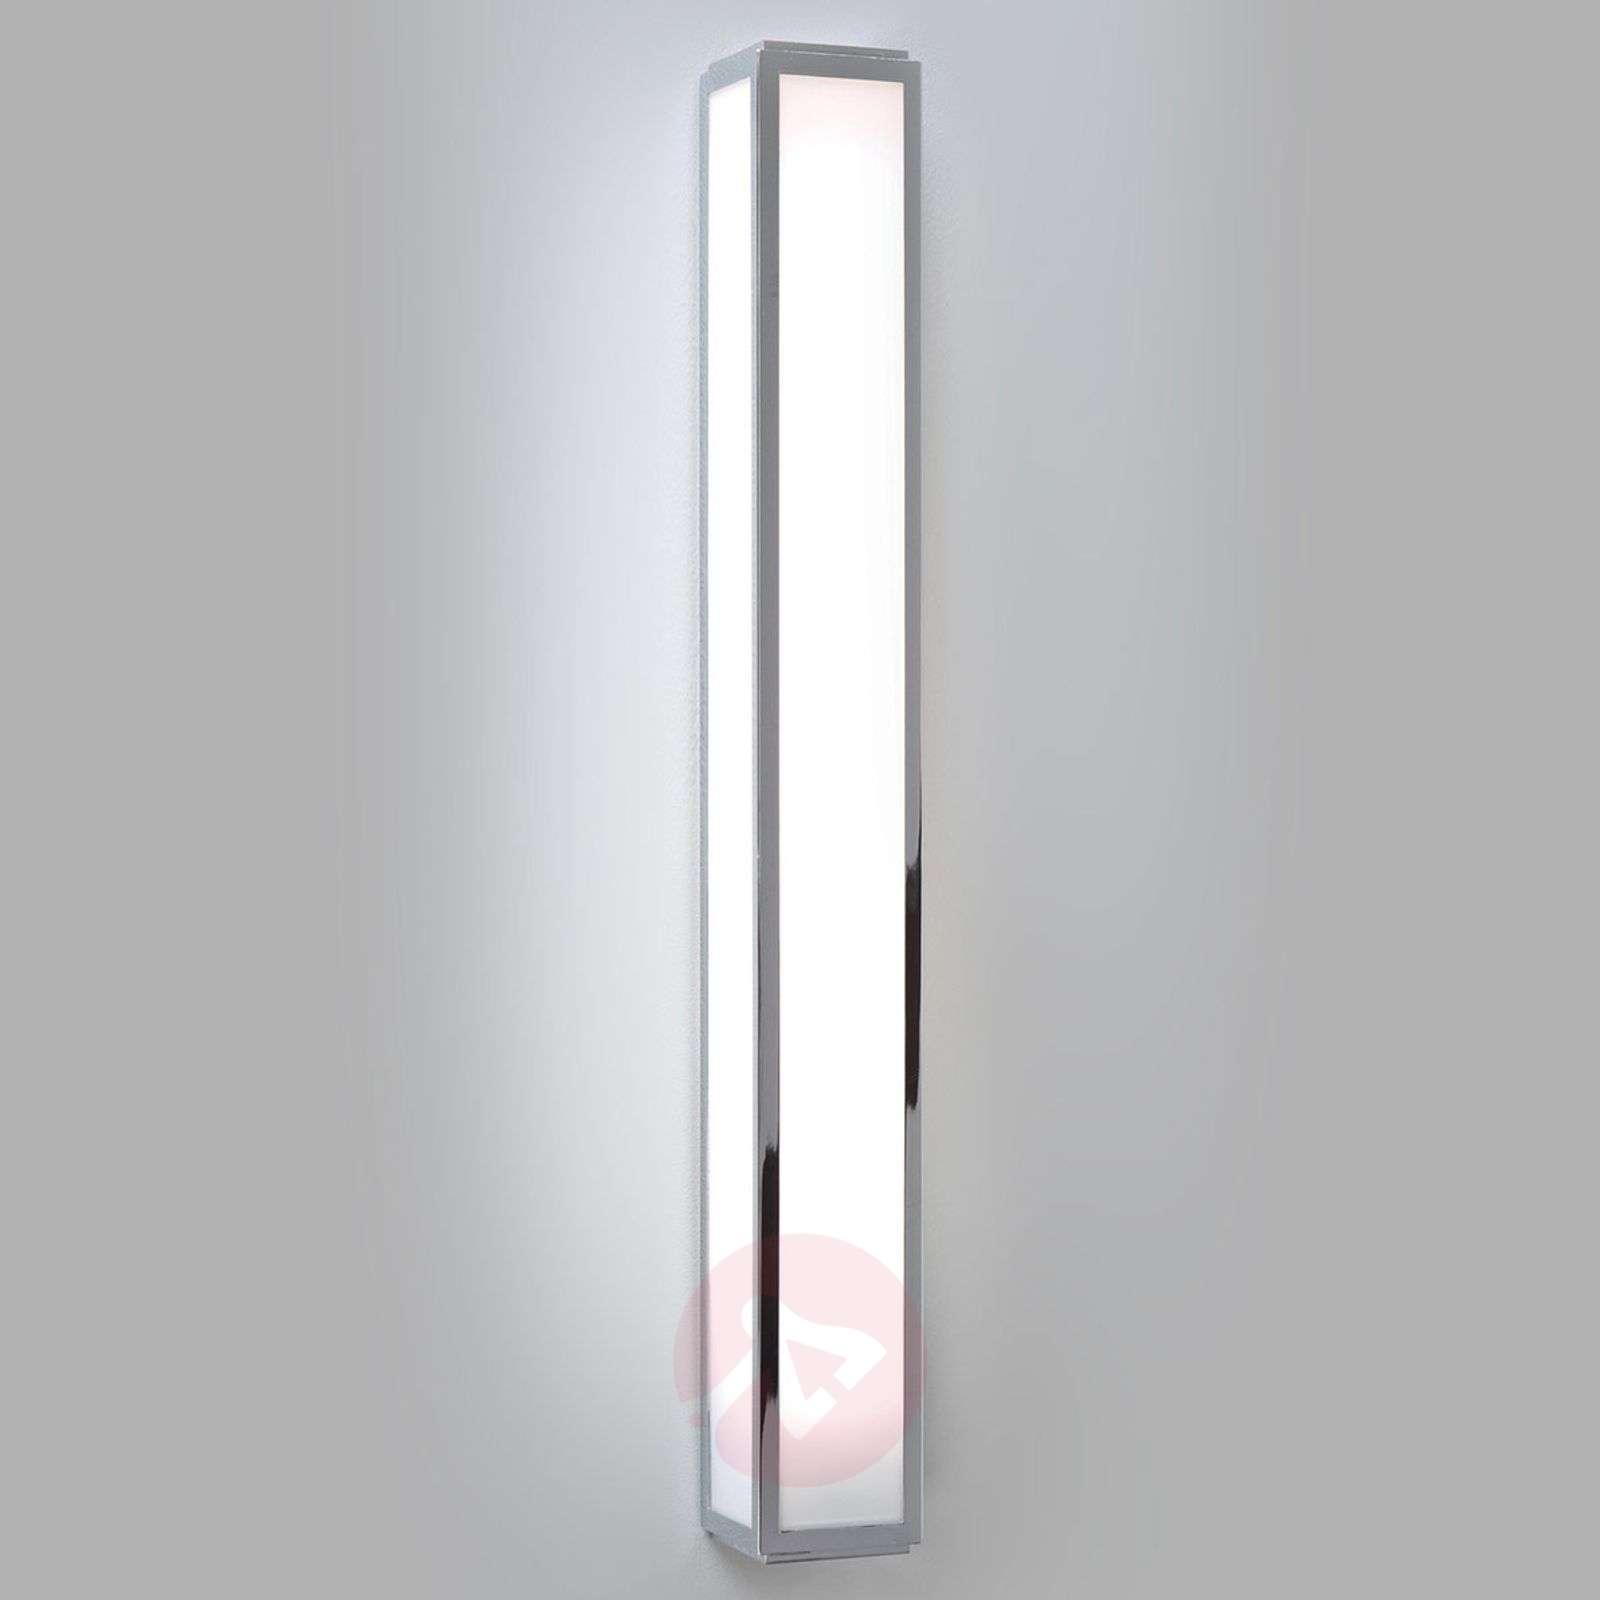 Mashiko 600 LED Wall Light Elongated-1020485-02